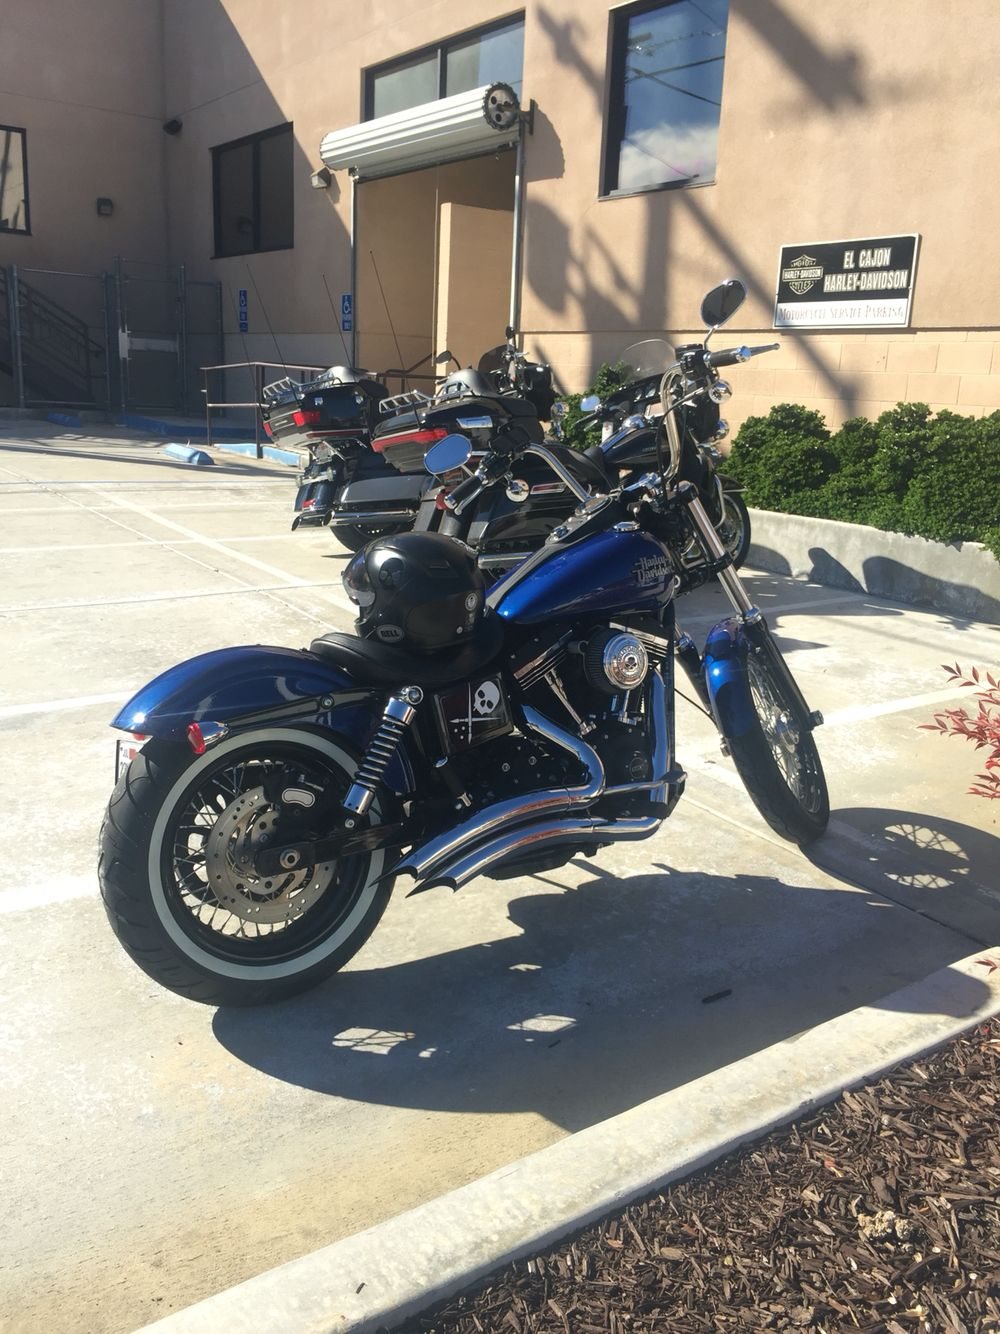 Harley Davidson Dyna Street Bob With White Wall Tire Superior